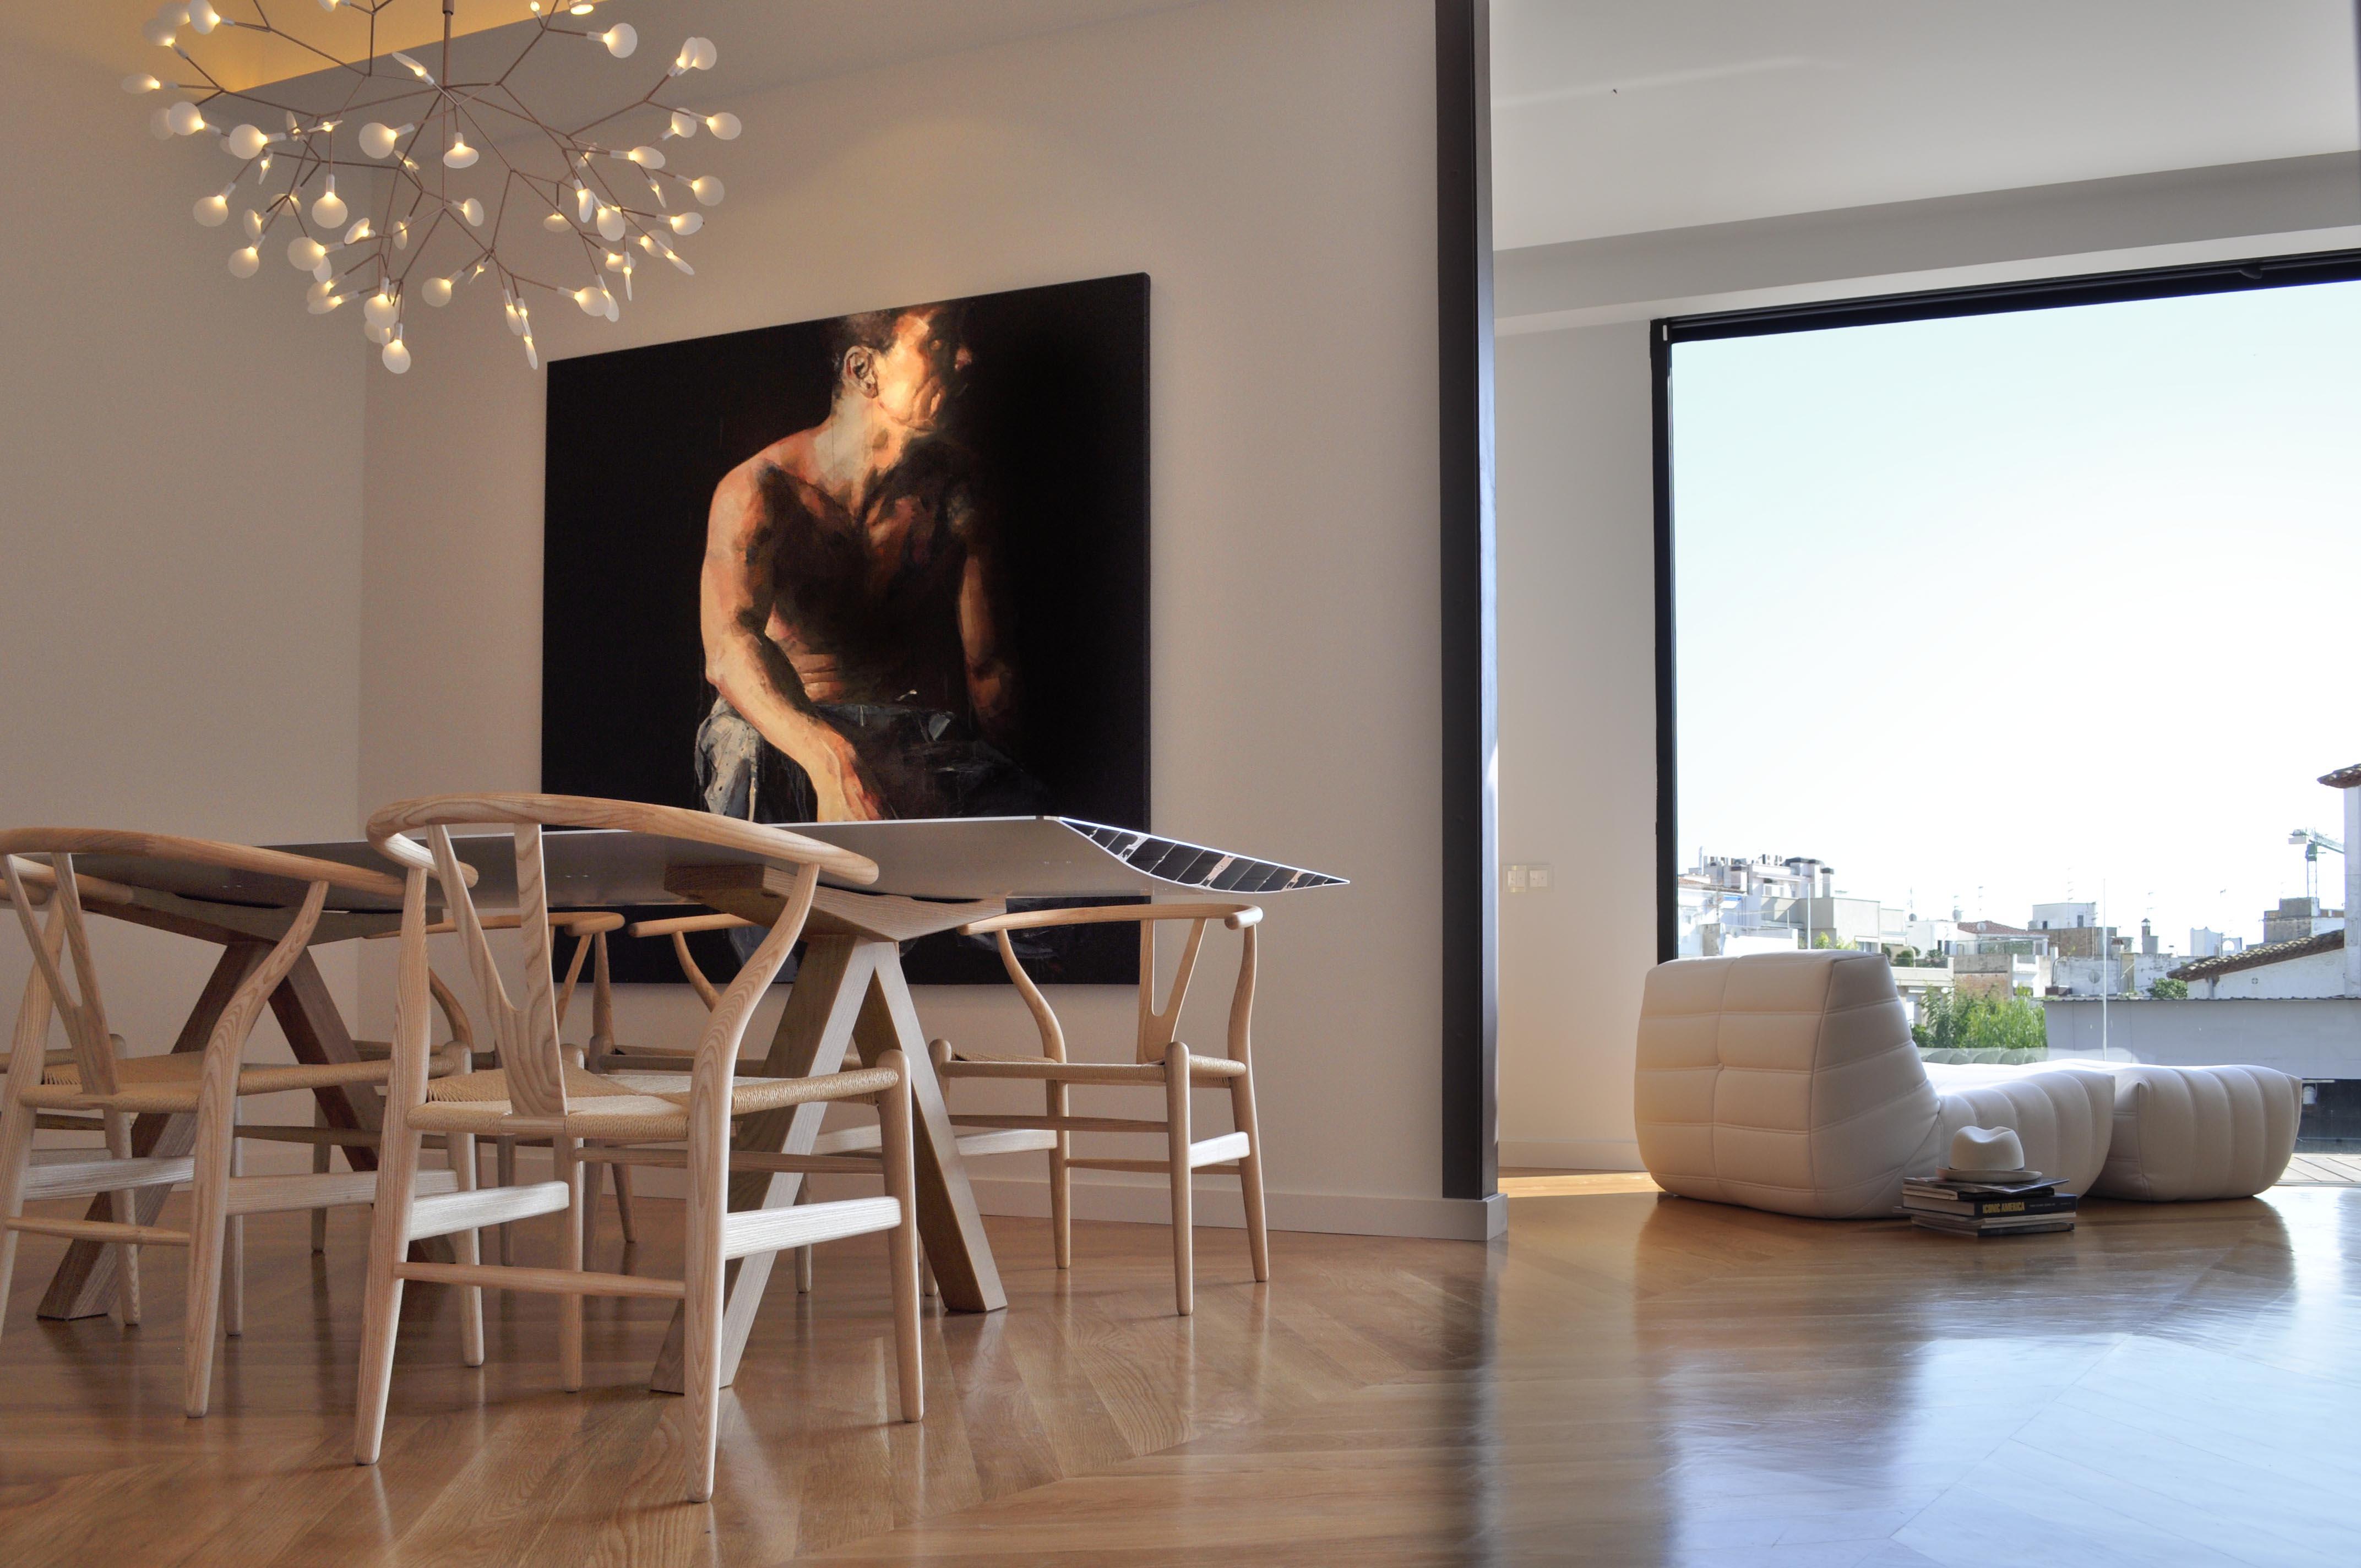 arquitectos-en-sitges-mesa-de-aluminio-bd-barcelona-architect-barcelona-sitges-dining-table